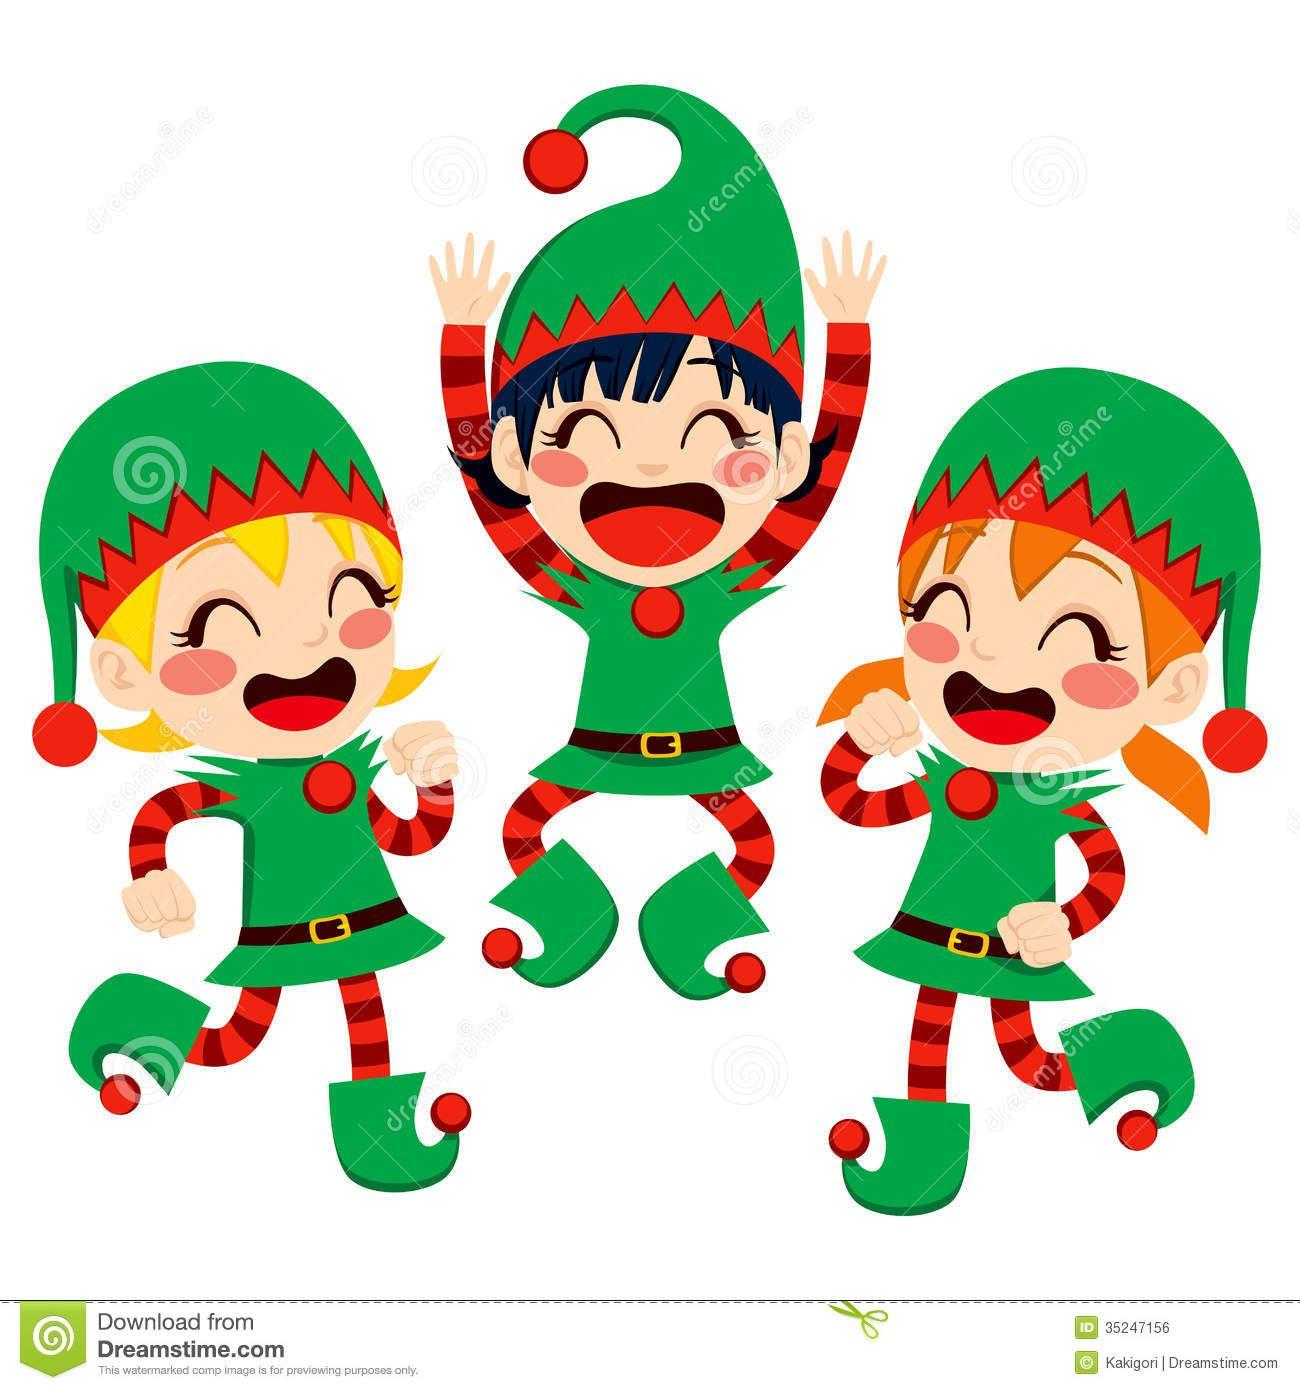 742682ba1e60371439dbfbd77f000482 santa claus helpers dancing rh pinterest com Christmas Joy Clip Art Christmas Count Down Calendar